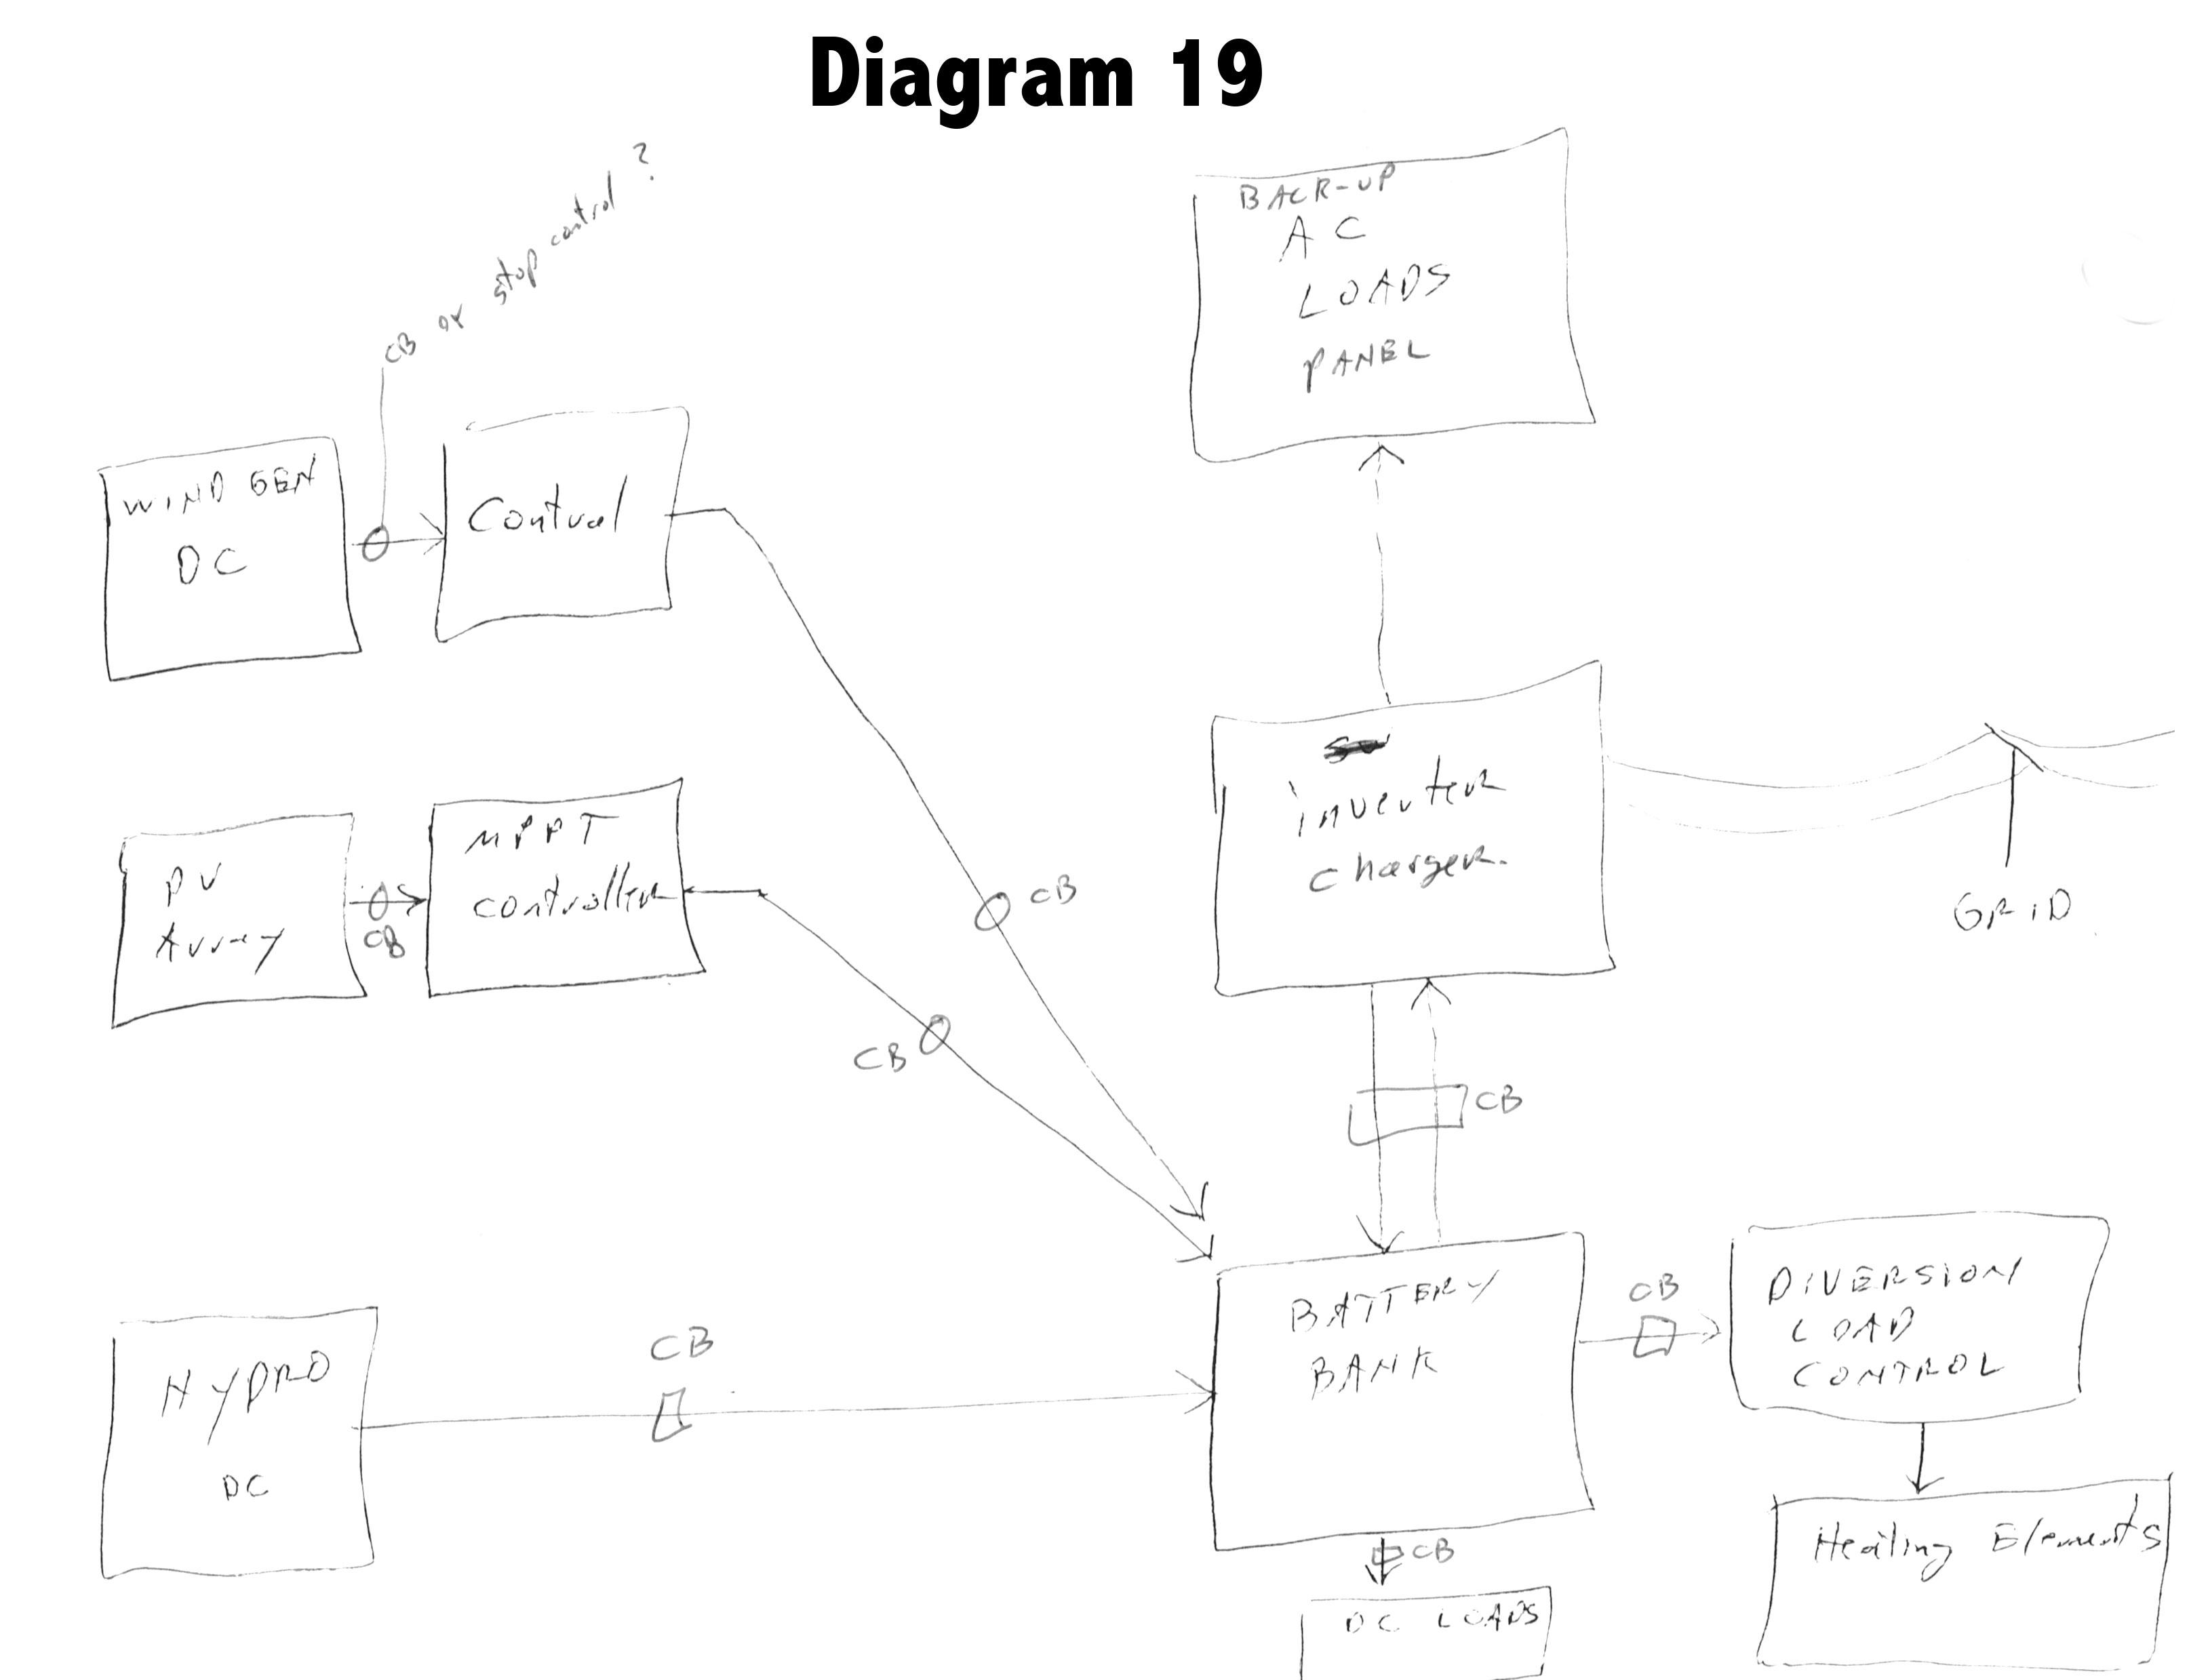 Install Blank Foot Anatomy Diagram